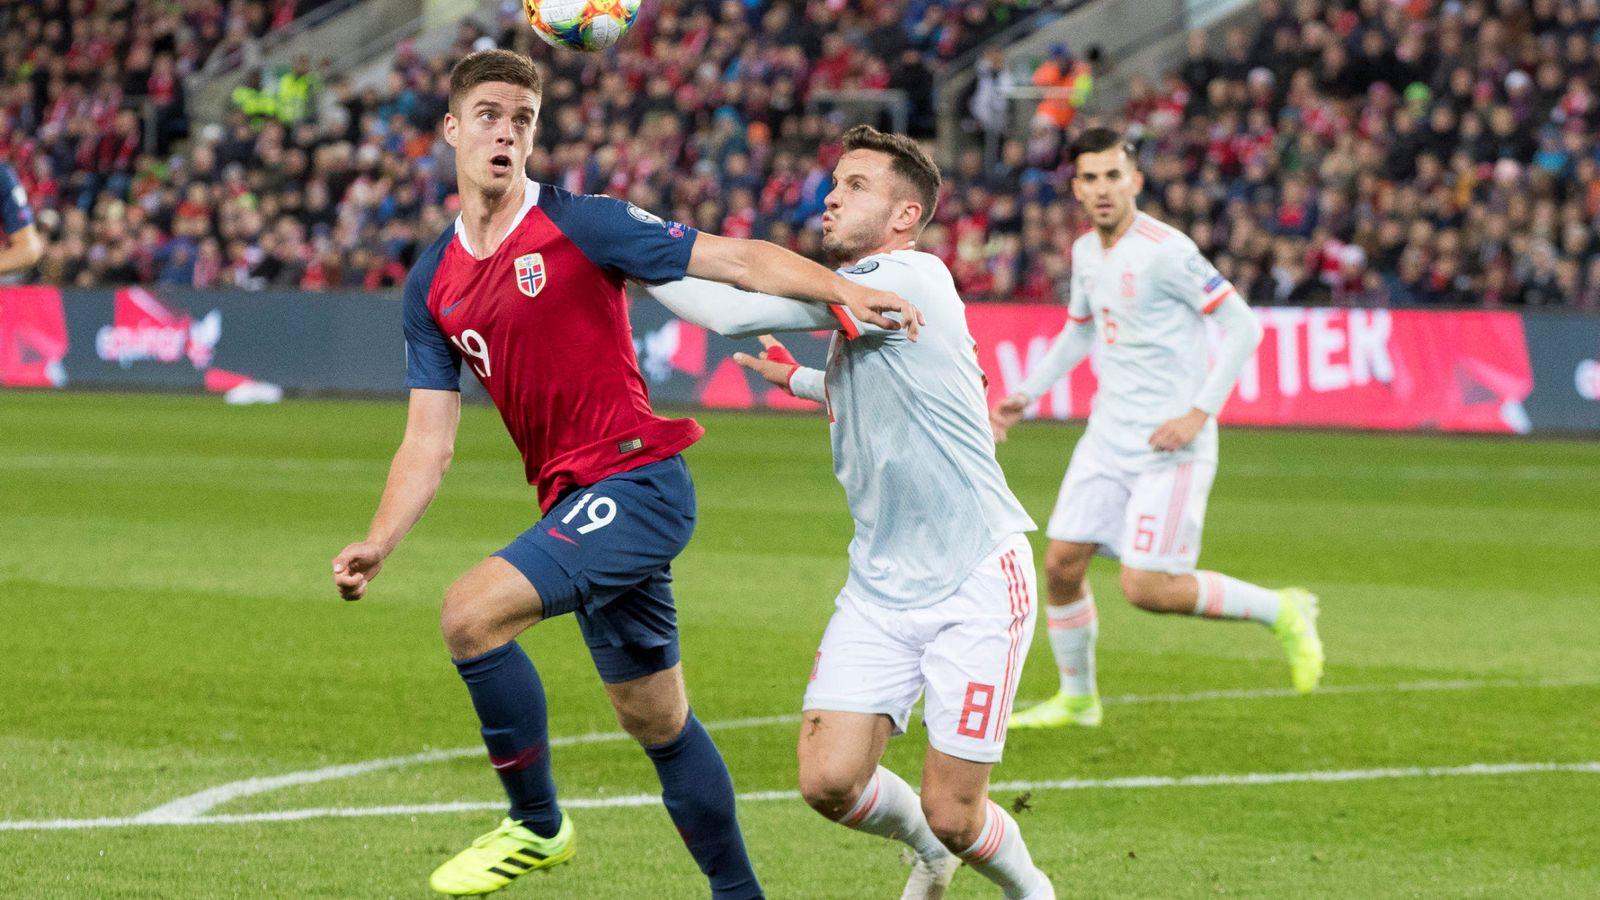 Foto: Soccer - euro 2020 qualifier - norway v spain - group f